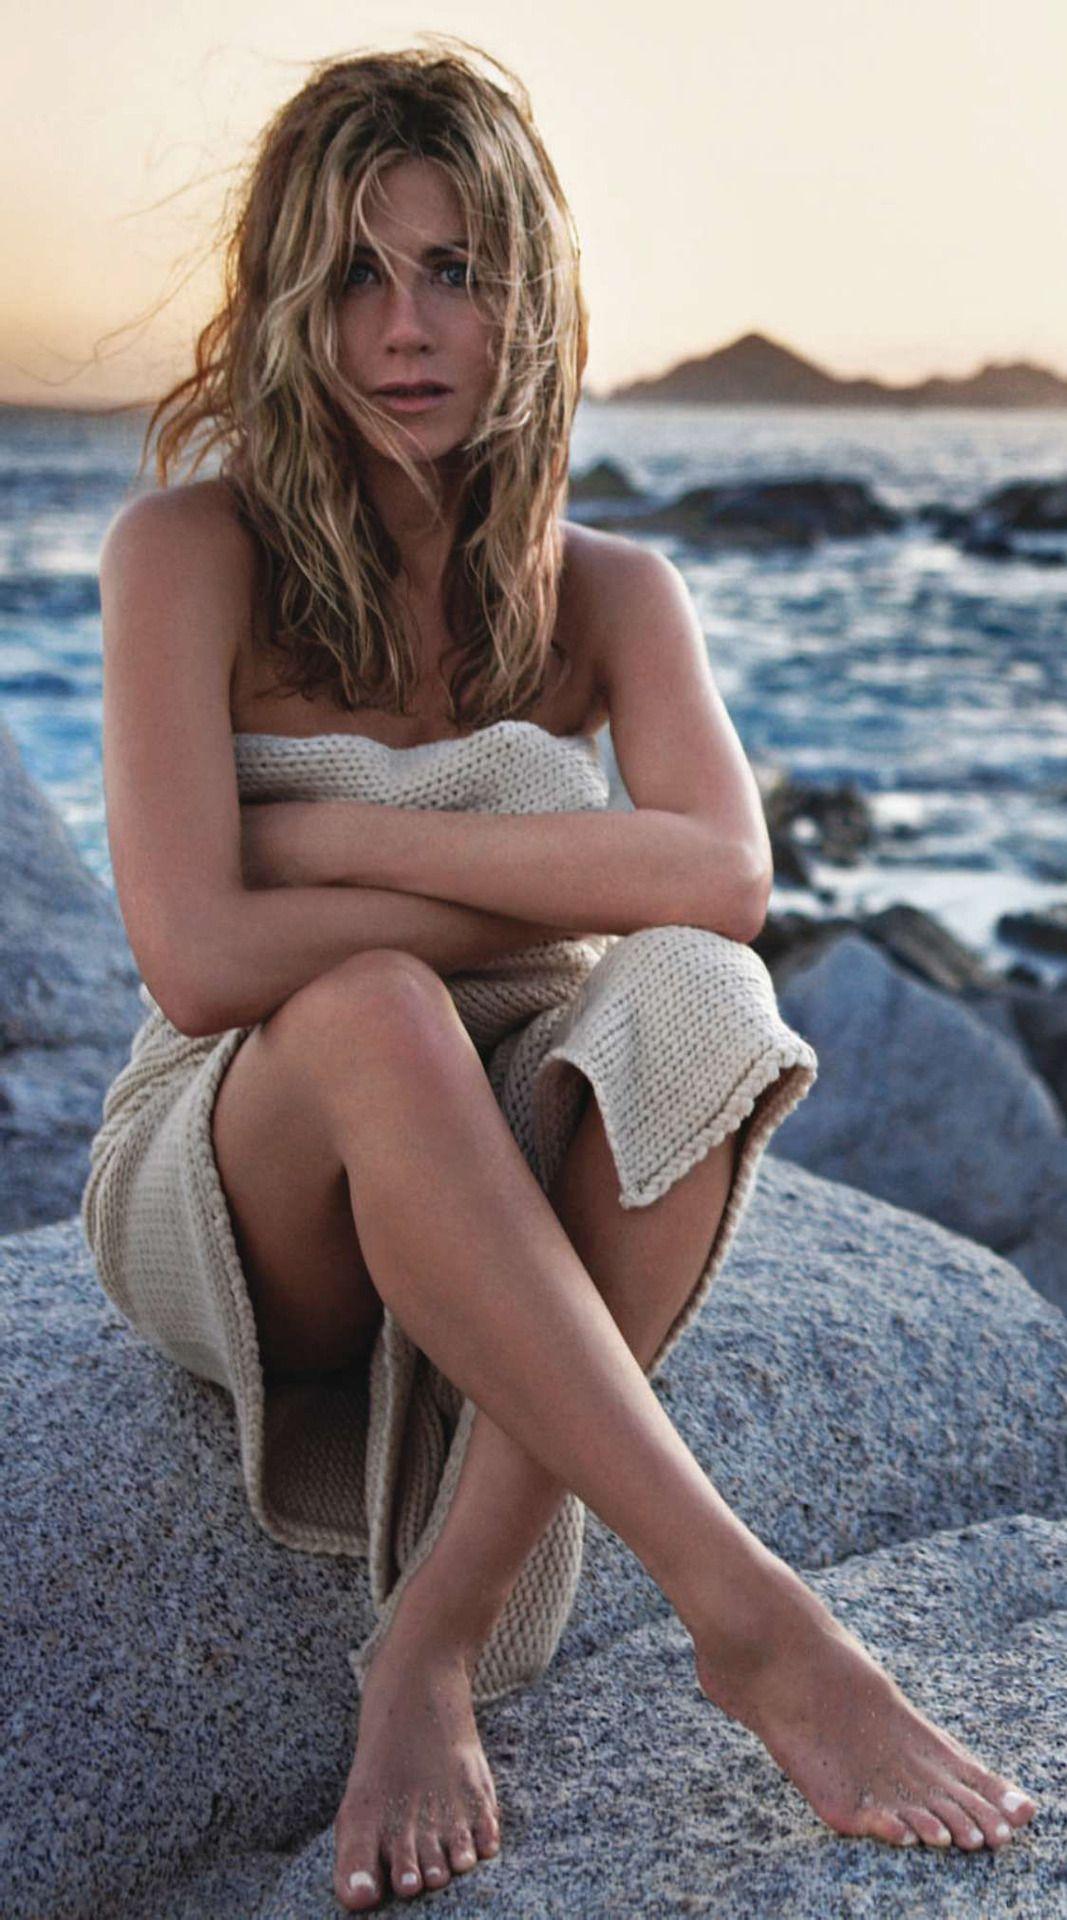 pics Nude pics of Avril Lavigne. 2018-2019 celebrityes photos leaks!